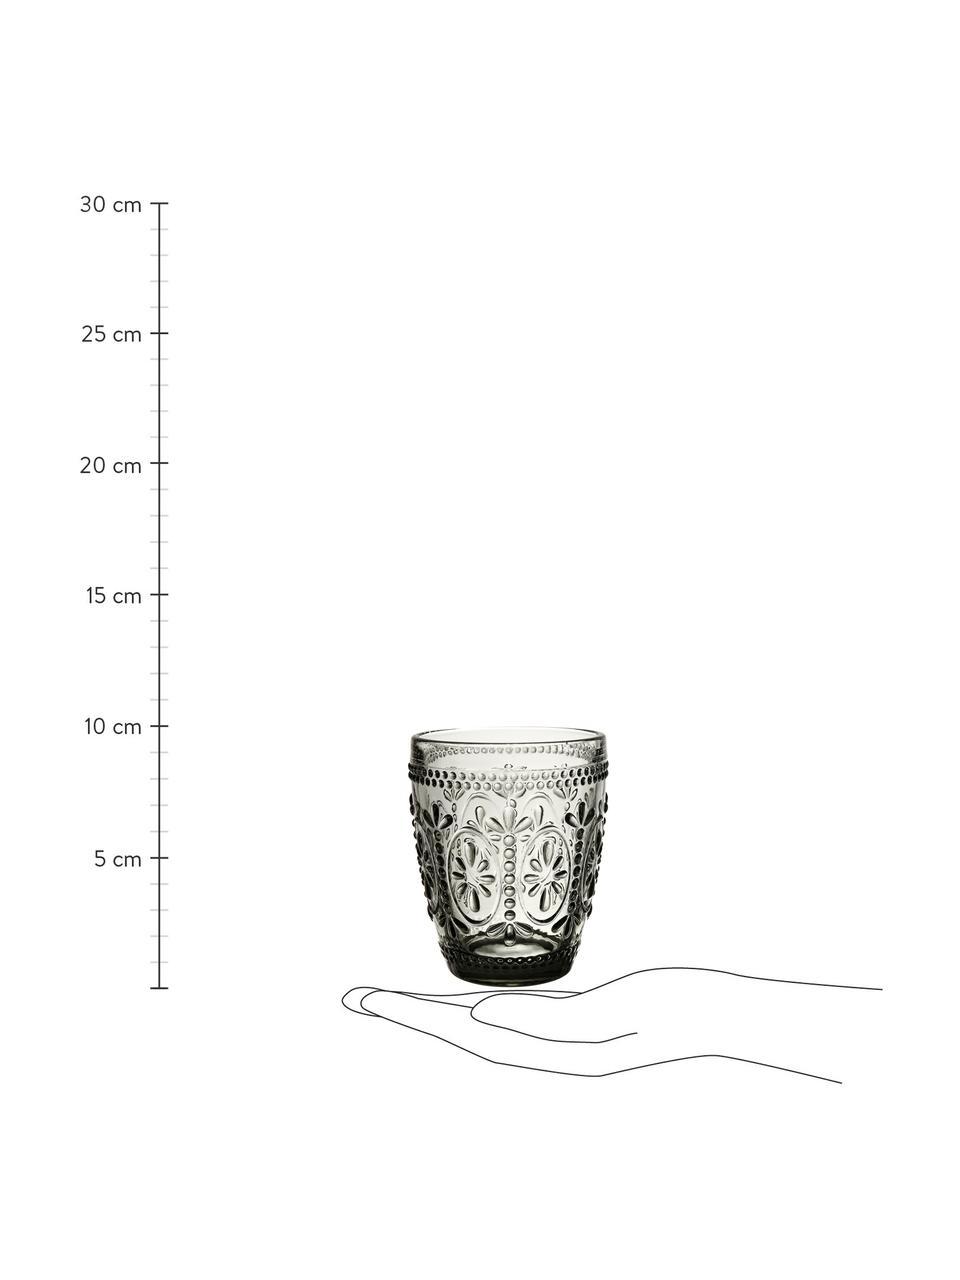 Waterglazen Chambord, 6 stuks, Glas, Grijs, Ø 8 x H 10 cm